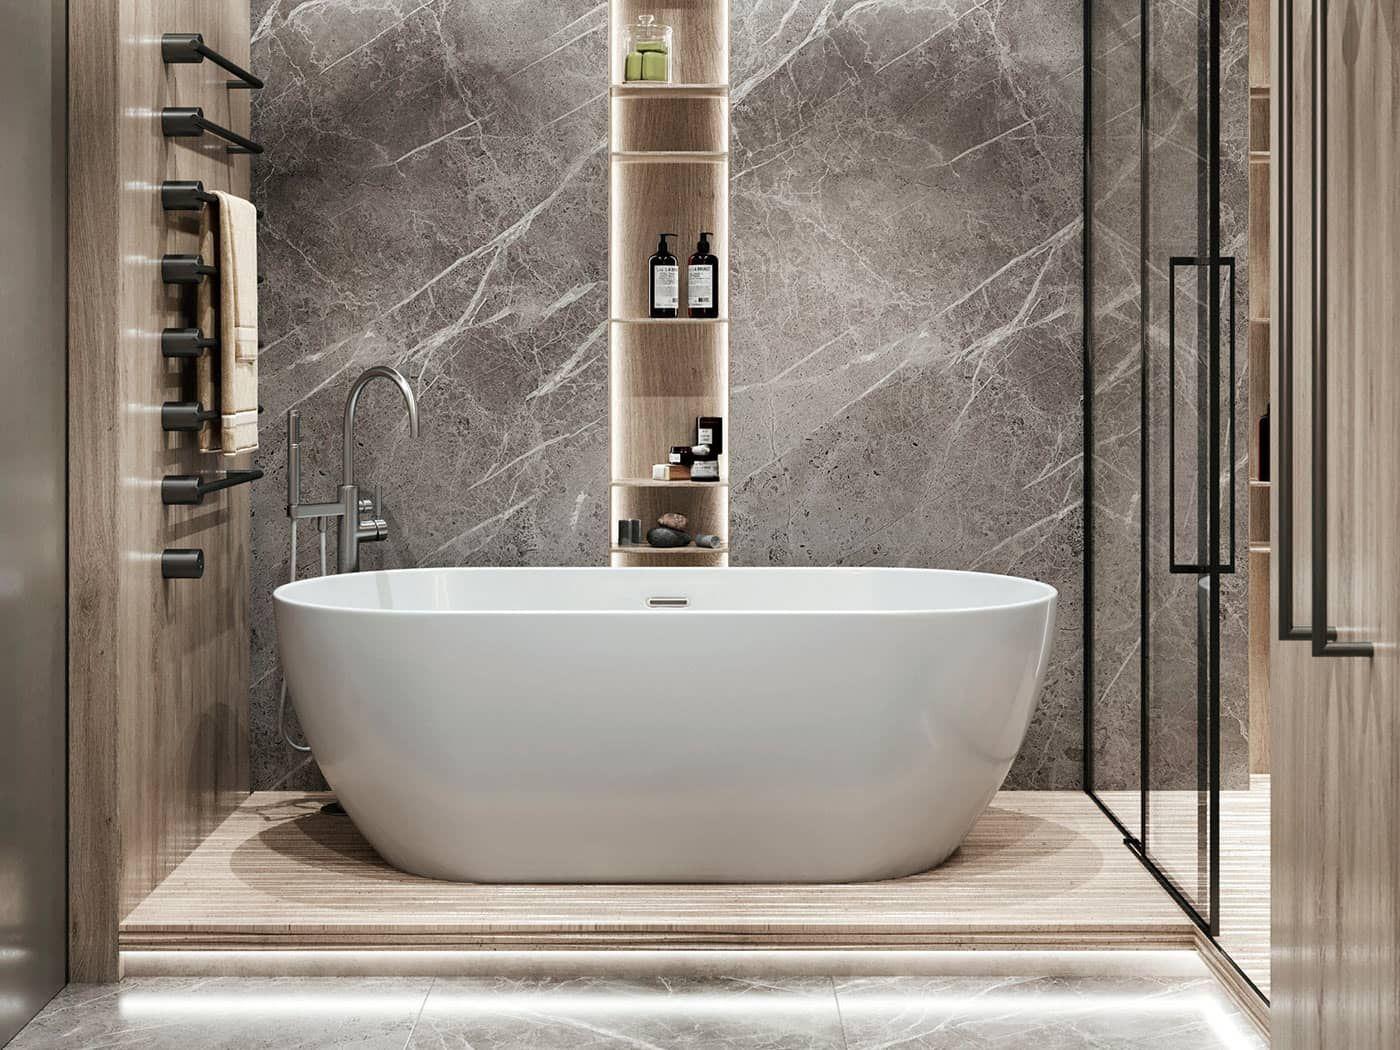 Mirax Park In 2021 Top Bathroom Design Modern Luxury Bathroom Bathroom Interior Design Top bathroom ceramic inspiration